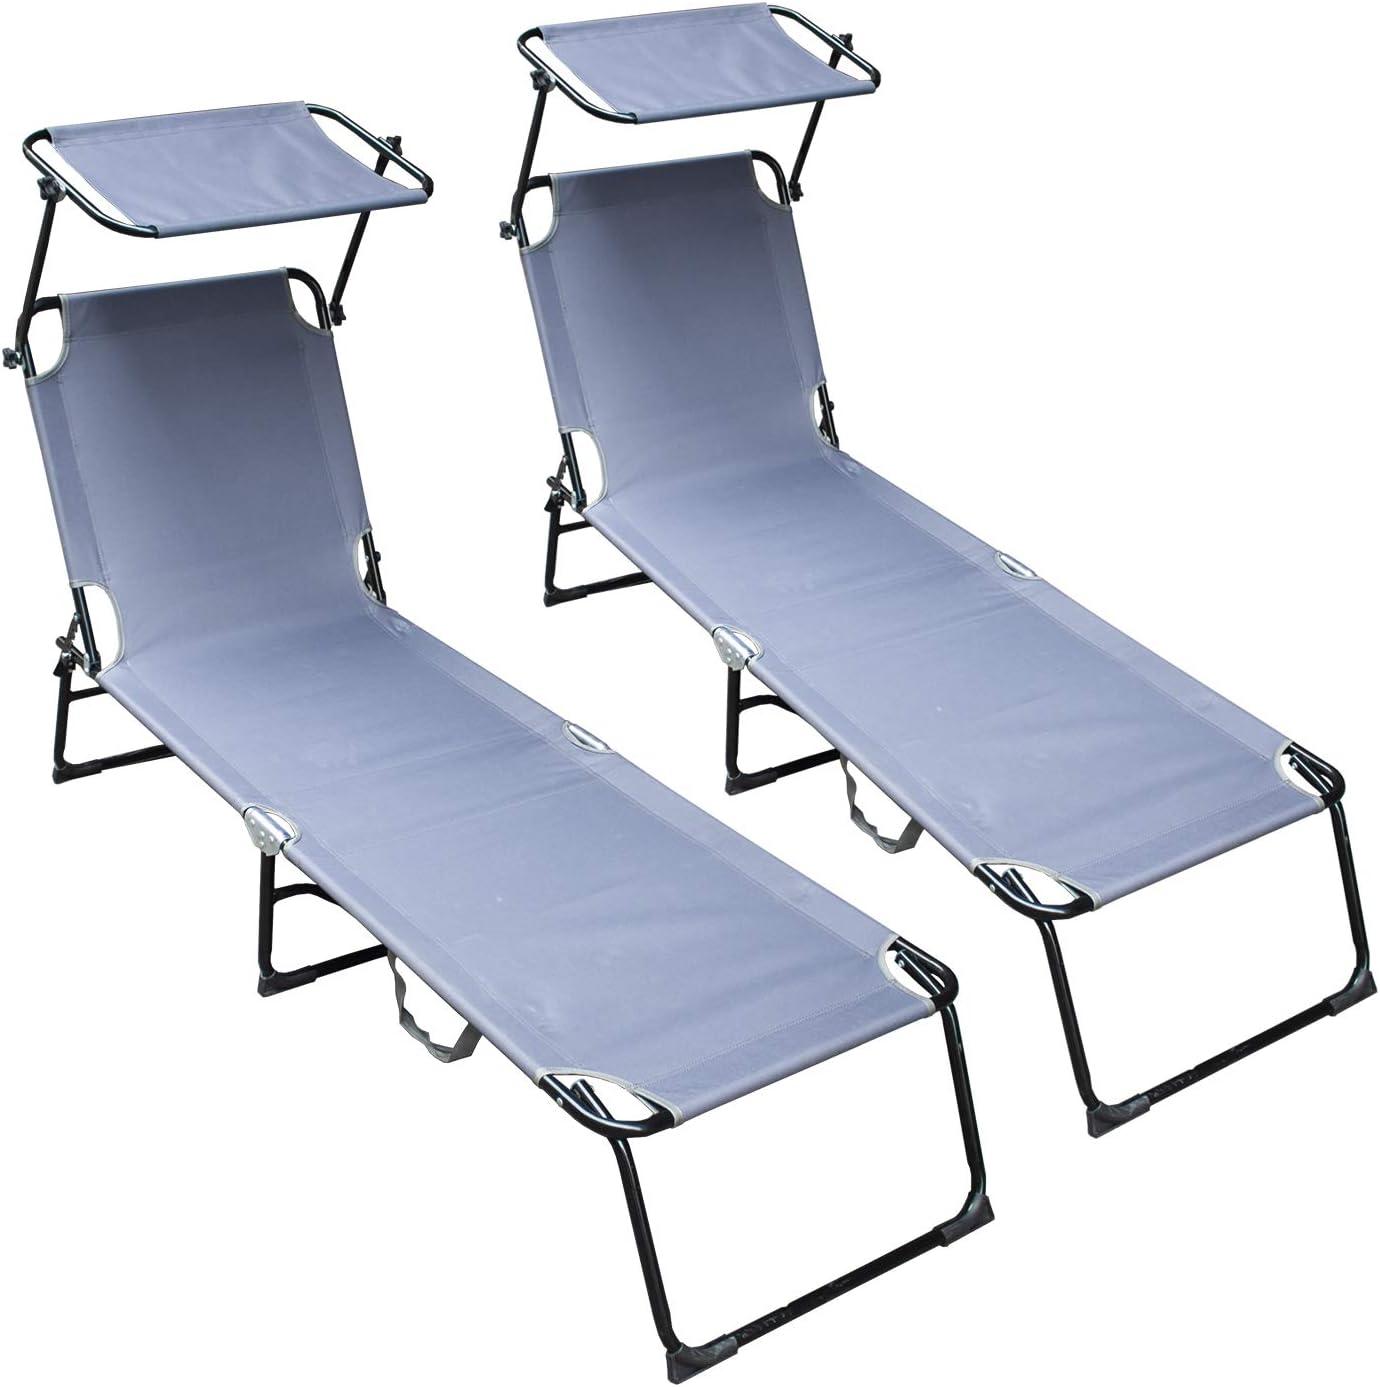 vingo Set de 2 Tumbona Ajustable Cama Hamaca Relax en Exterior Piscina Terraza Camping Jardin Playa 189x55x27cm Gris: Amazon.es: Jardín